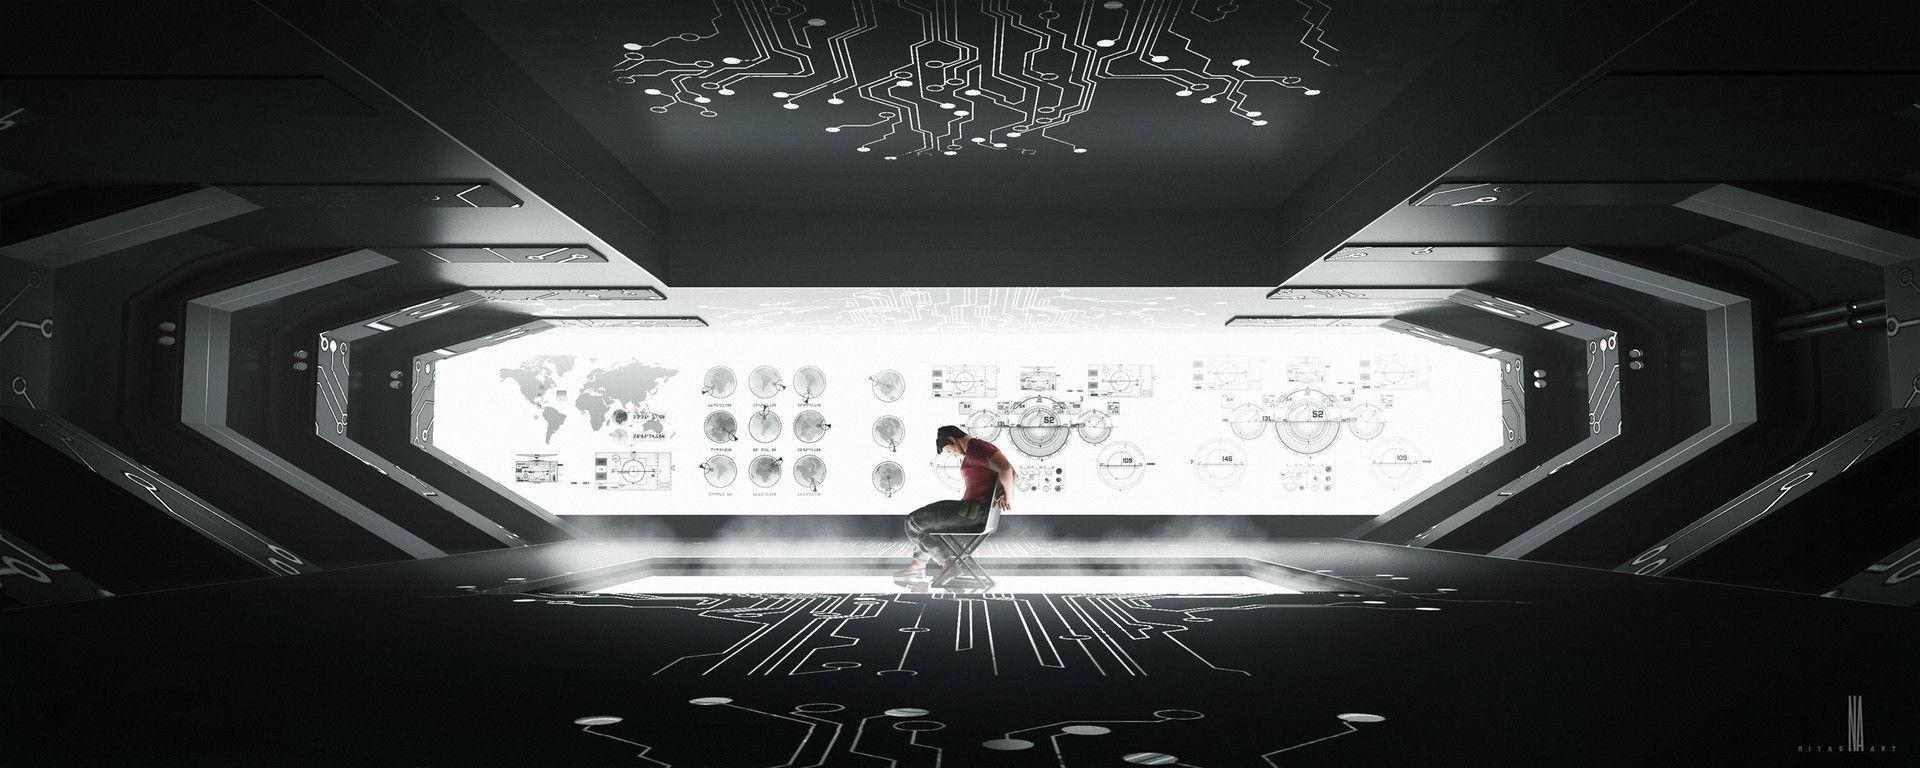 Interrogation Room By Niyas Ck In 2021 Futuristic Technology Installation Art Travel Outdoors Arts live education room